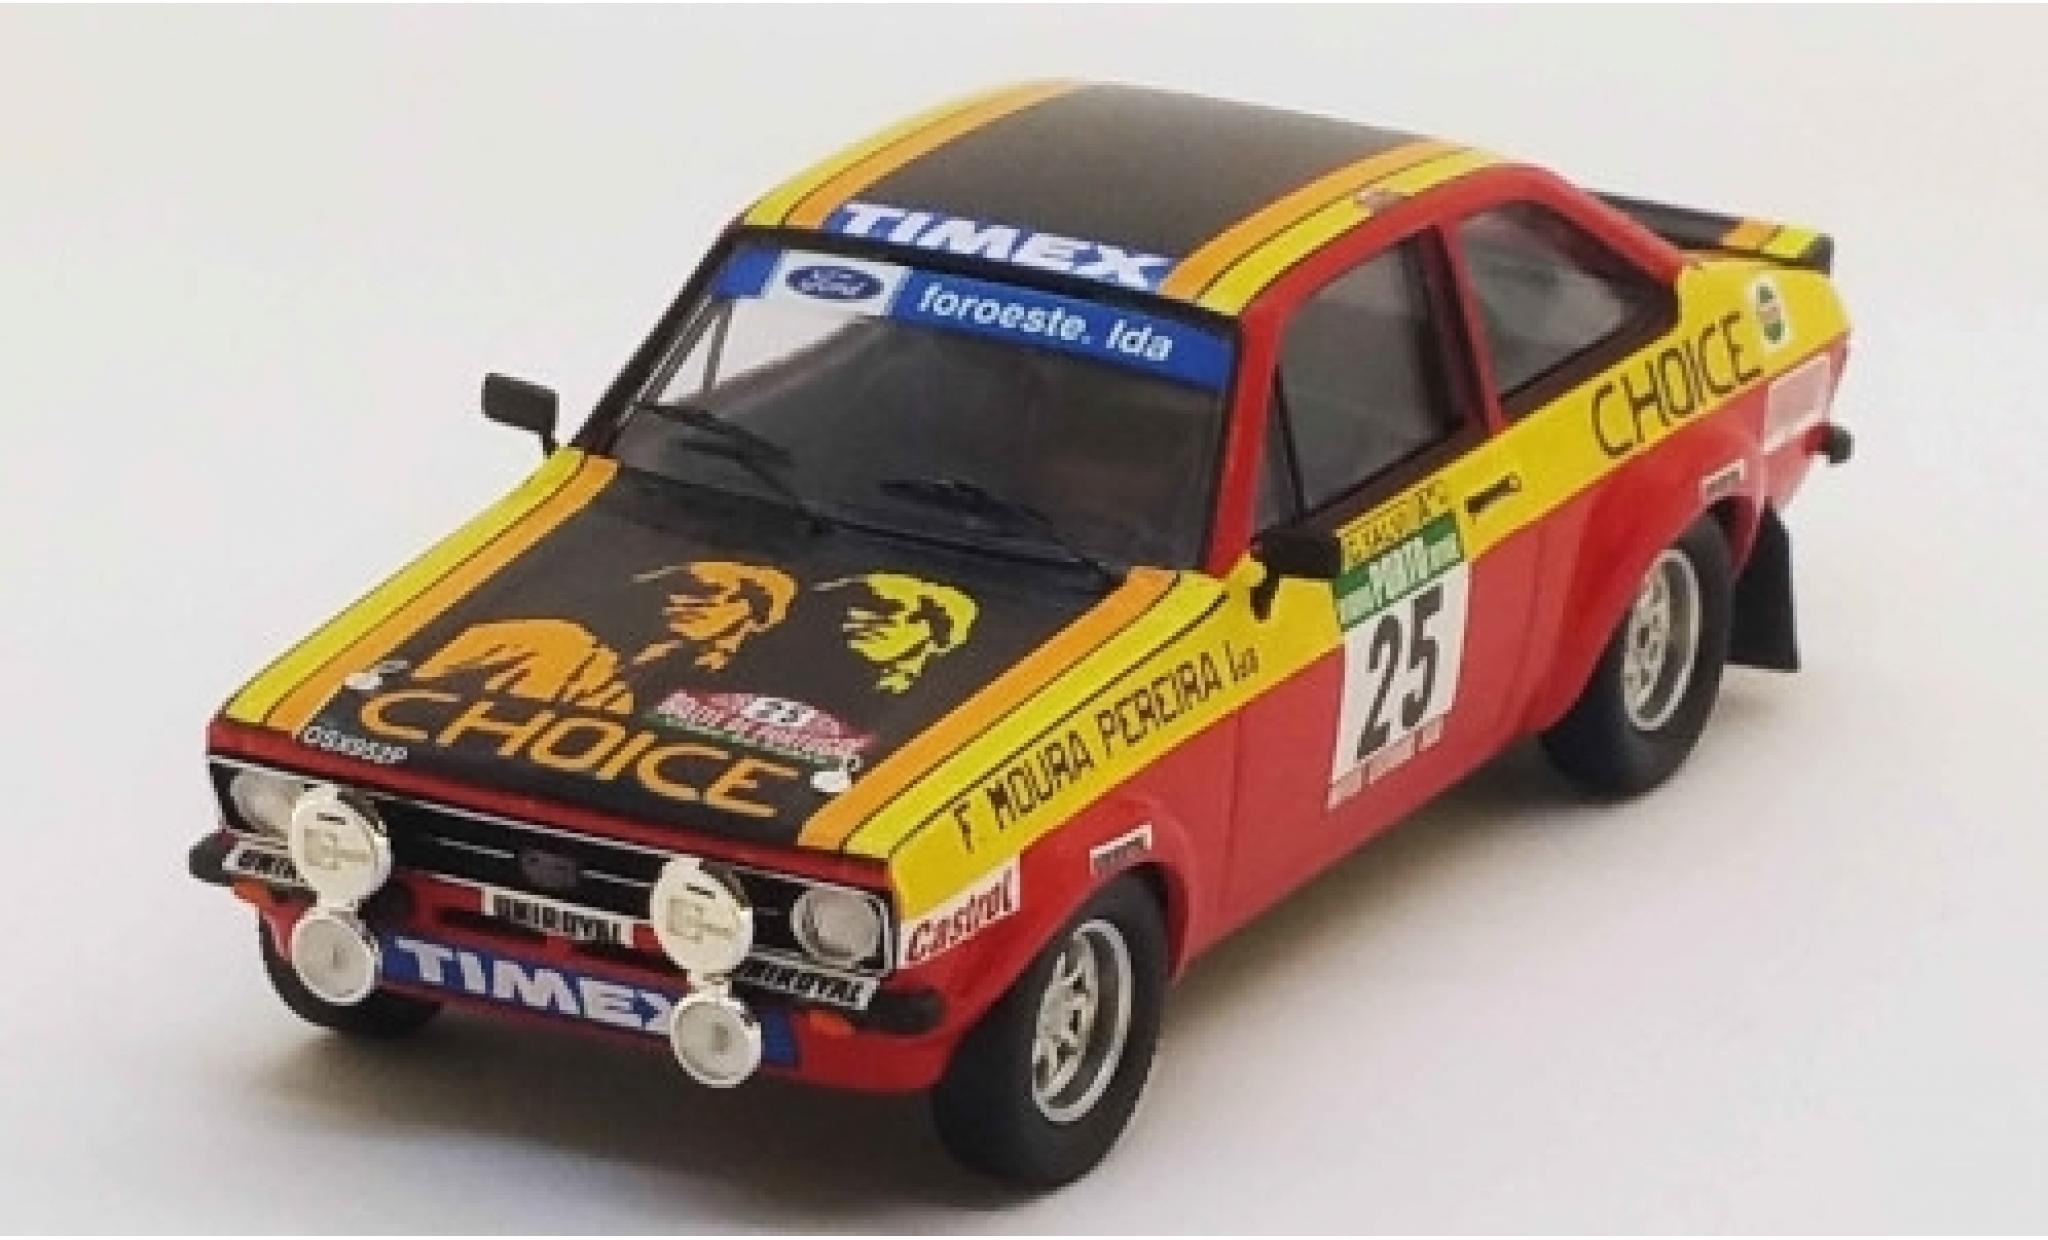 Ford Escort 1/43 Trofeu MK II No.25 Choice Rallye WM Rally Portugal 1978 G.Salvi/Z.Matriculas